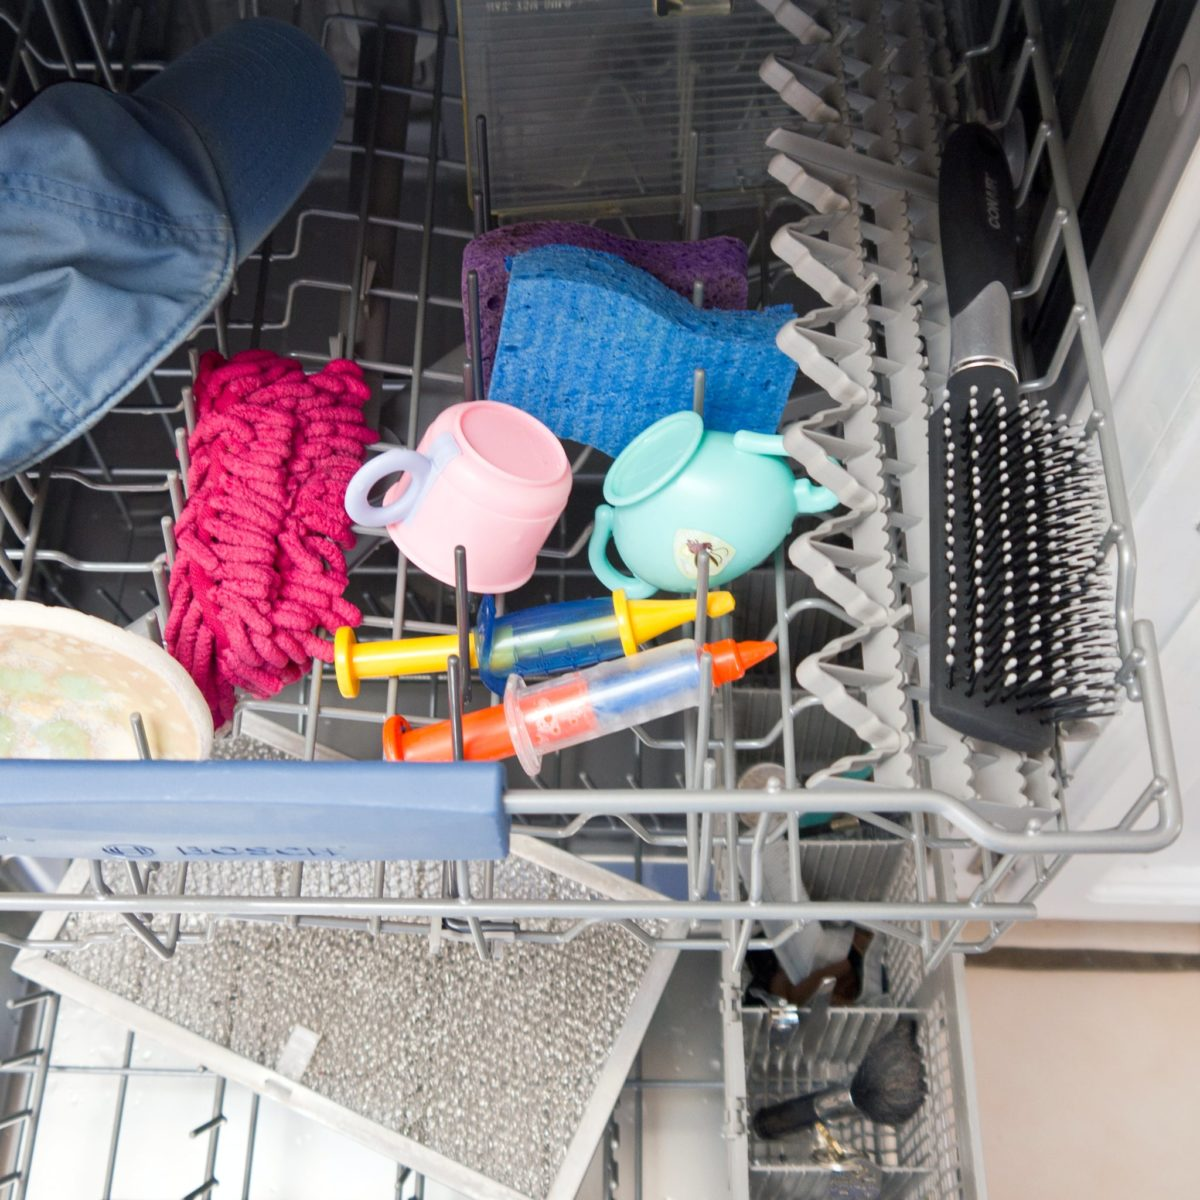 lavastoviglie-lavaggio-2